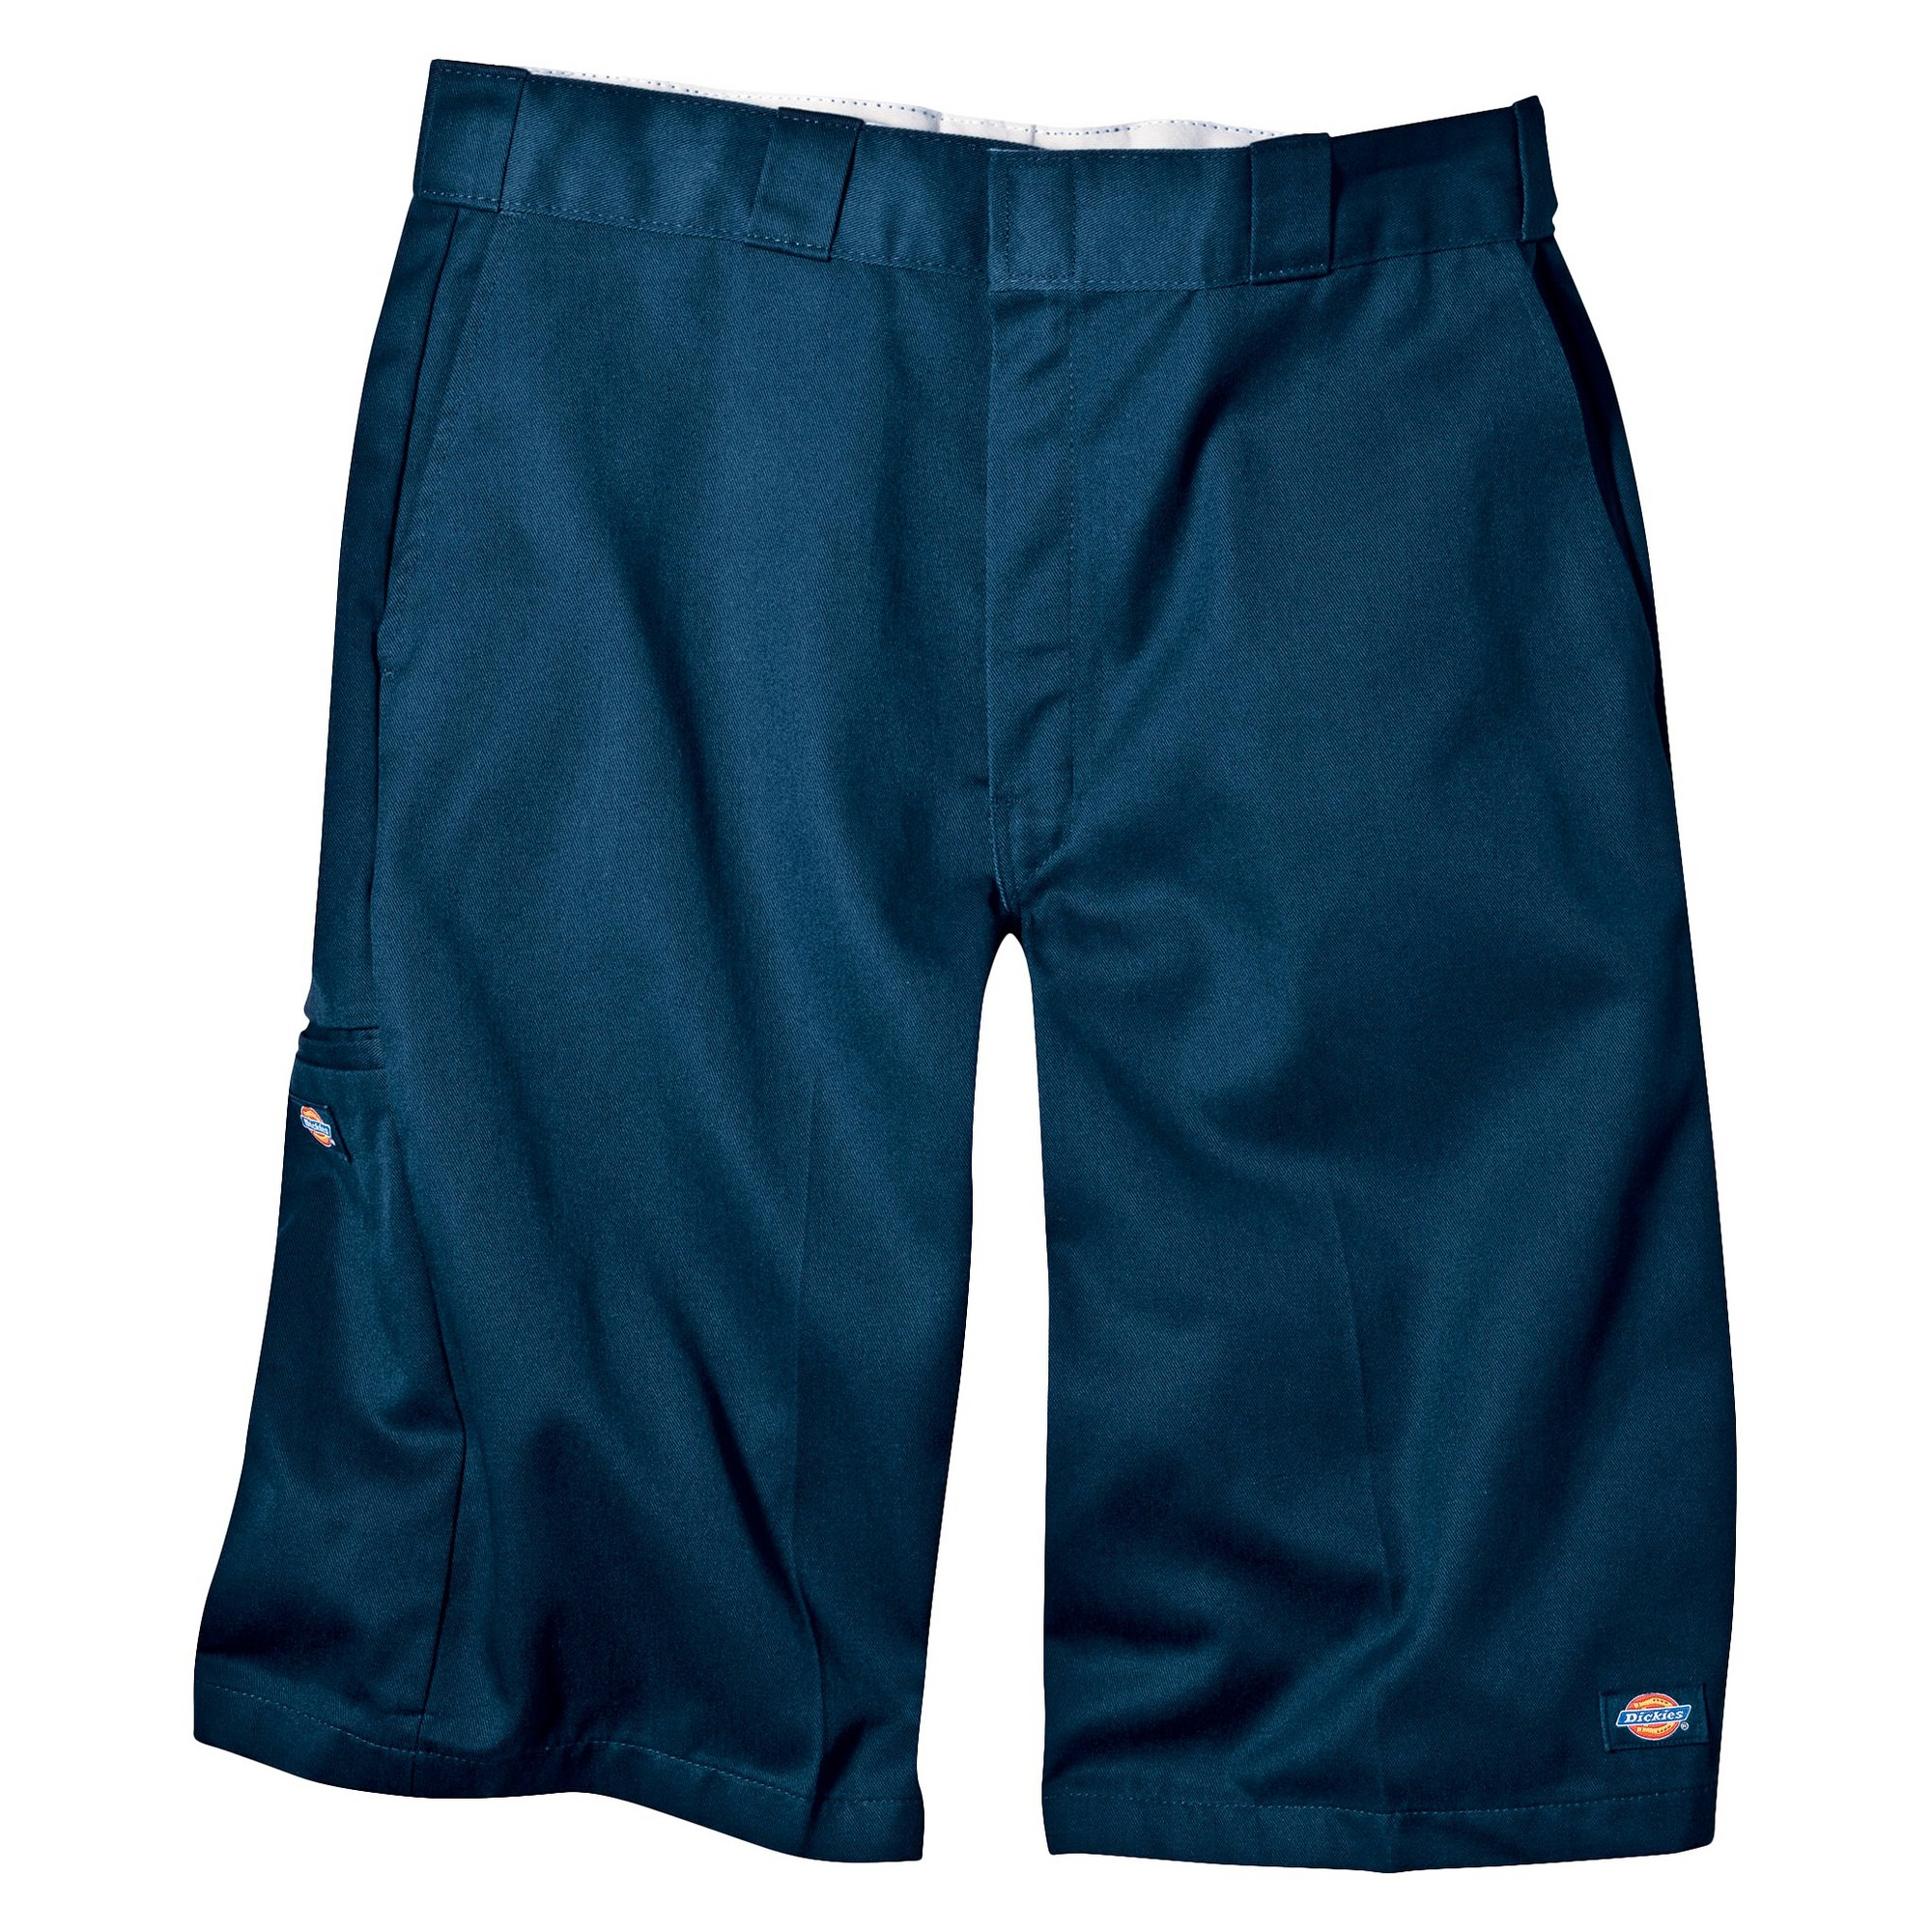 'Dickies Men's Big & Tall Loose Fit Twill 13'' Multi-Pocket Work Shorts- Dark Navy 54, Dark Blue'